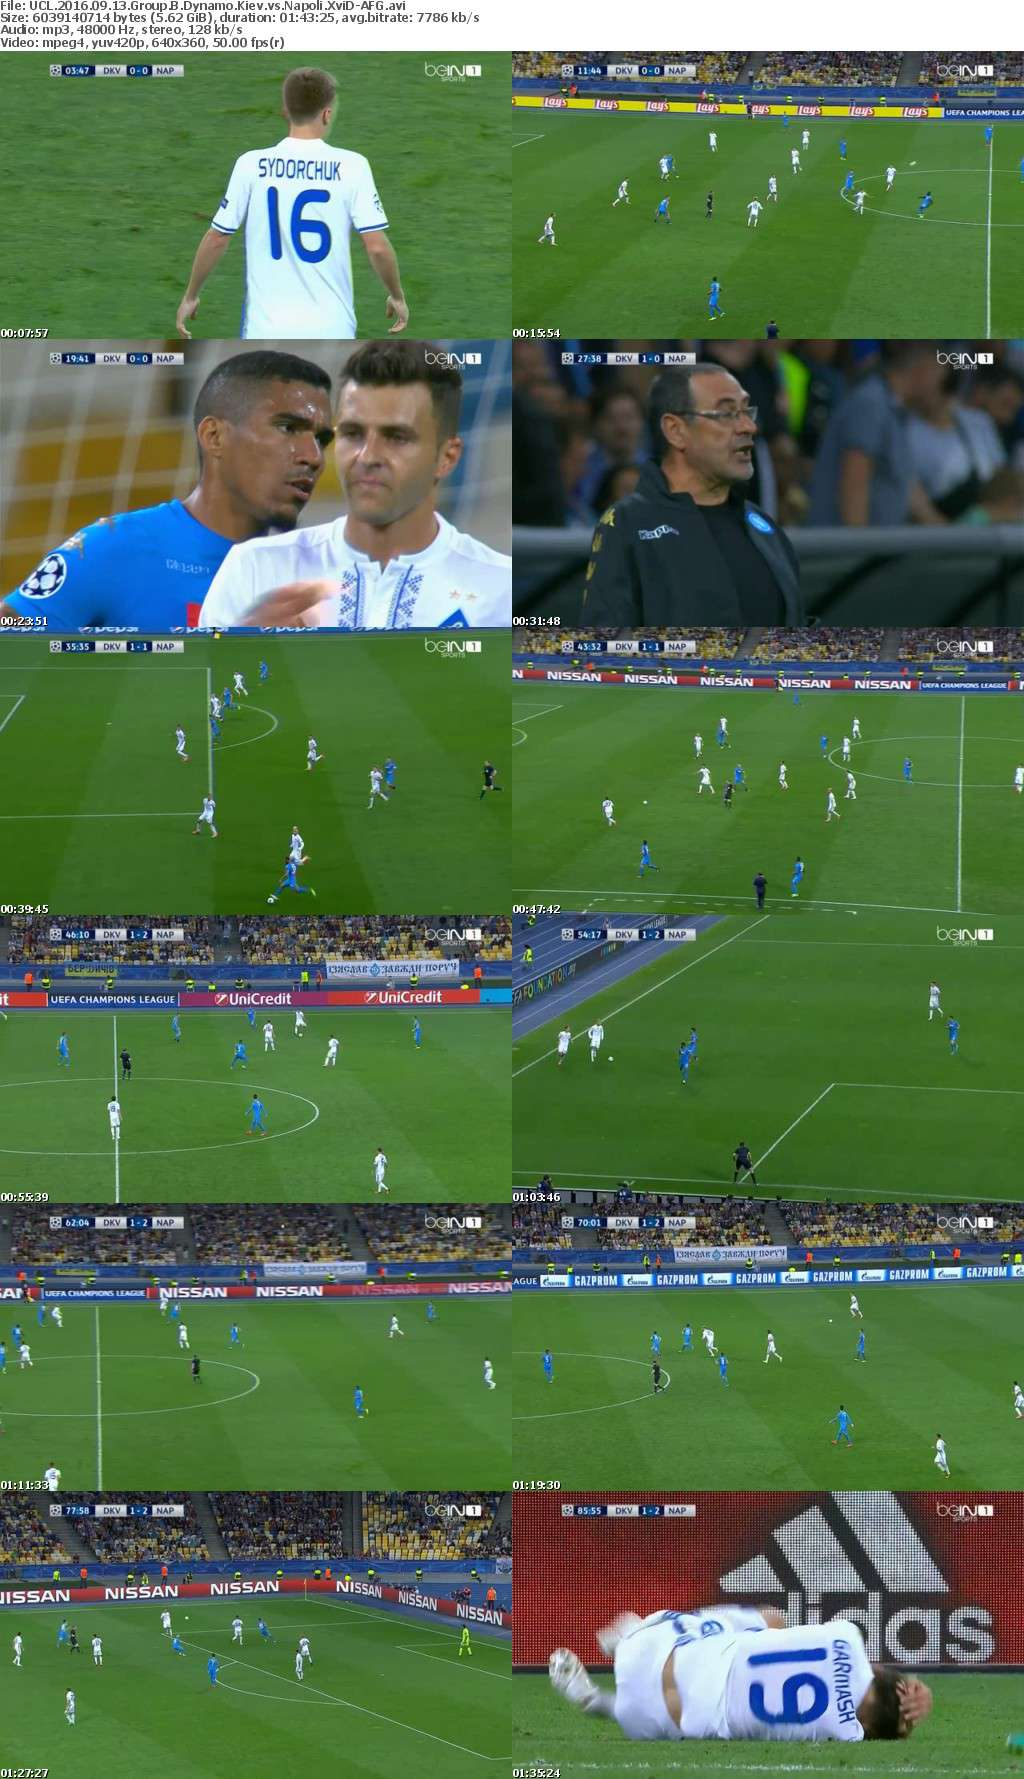 UCL 2016 09 13 Group B Dynamo Kiev vs Napoli XviD-AFG